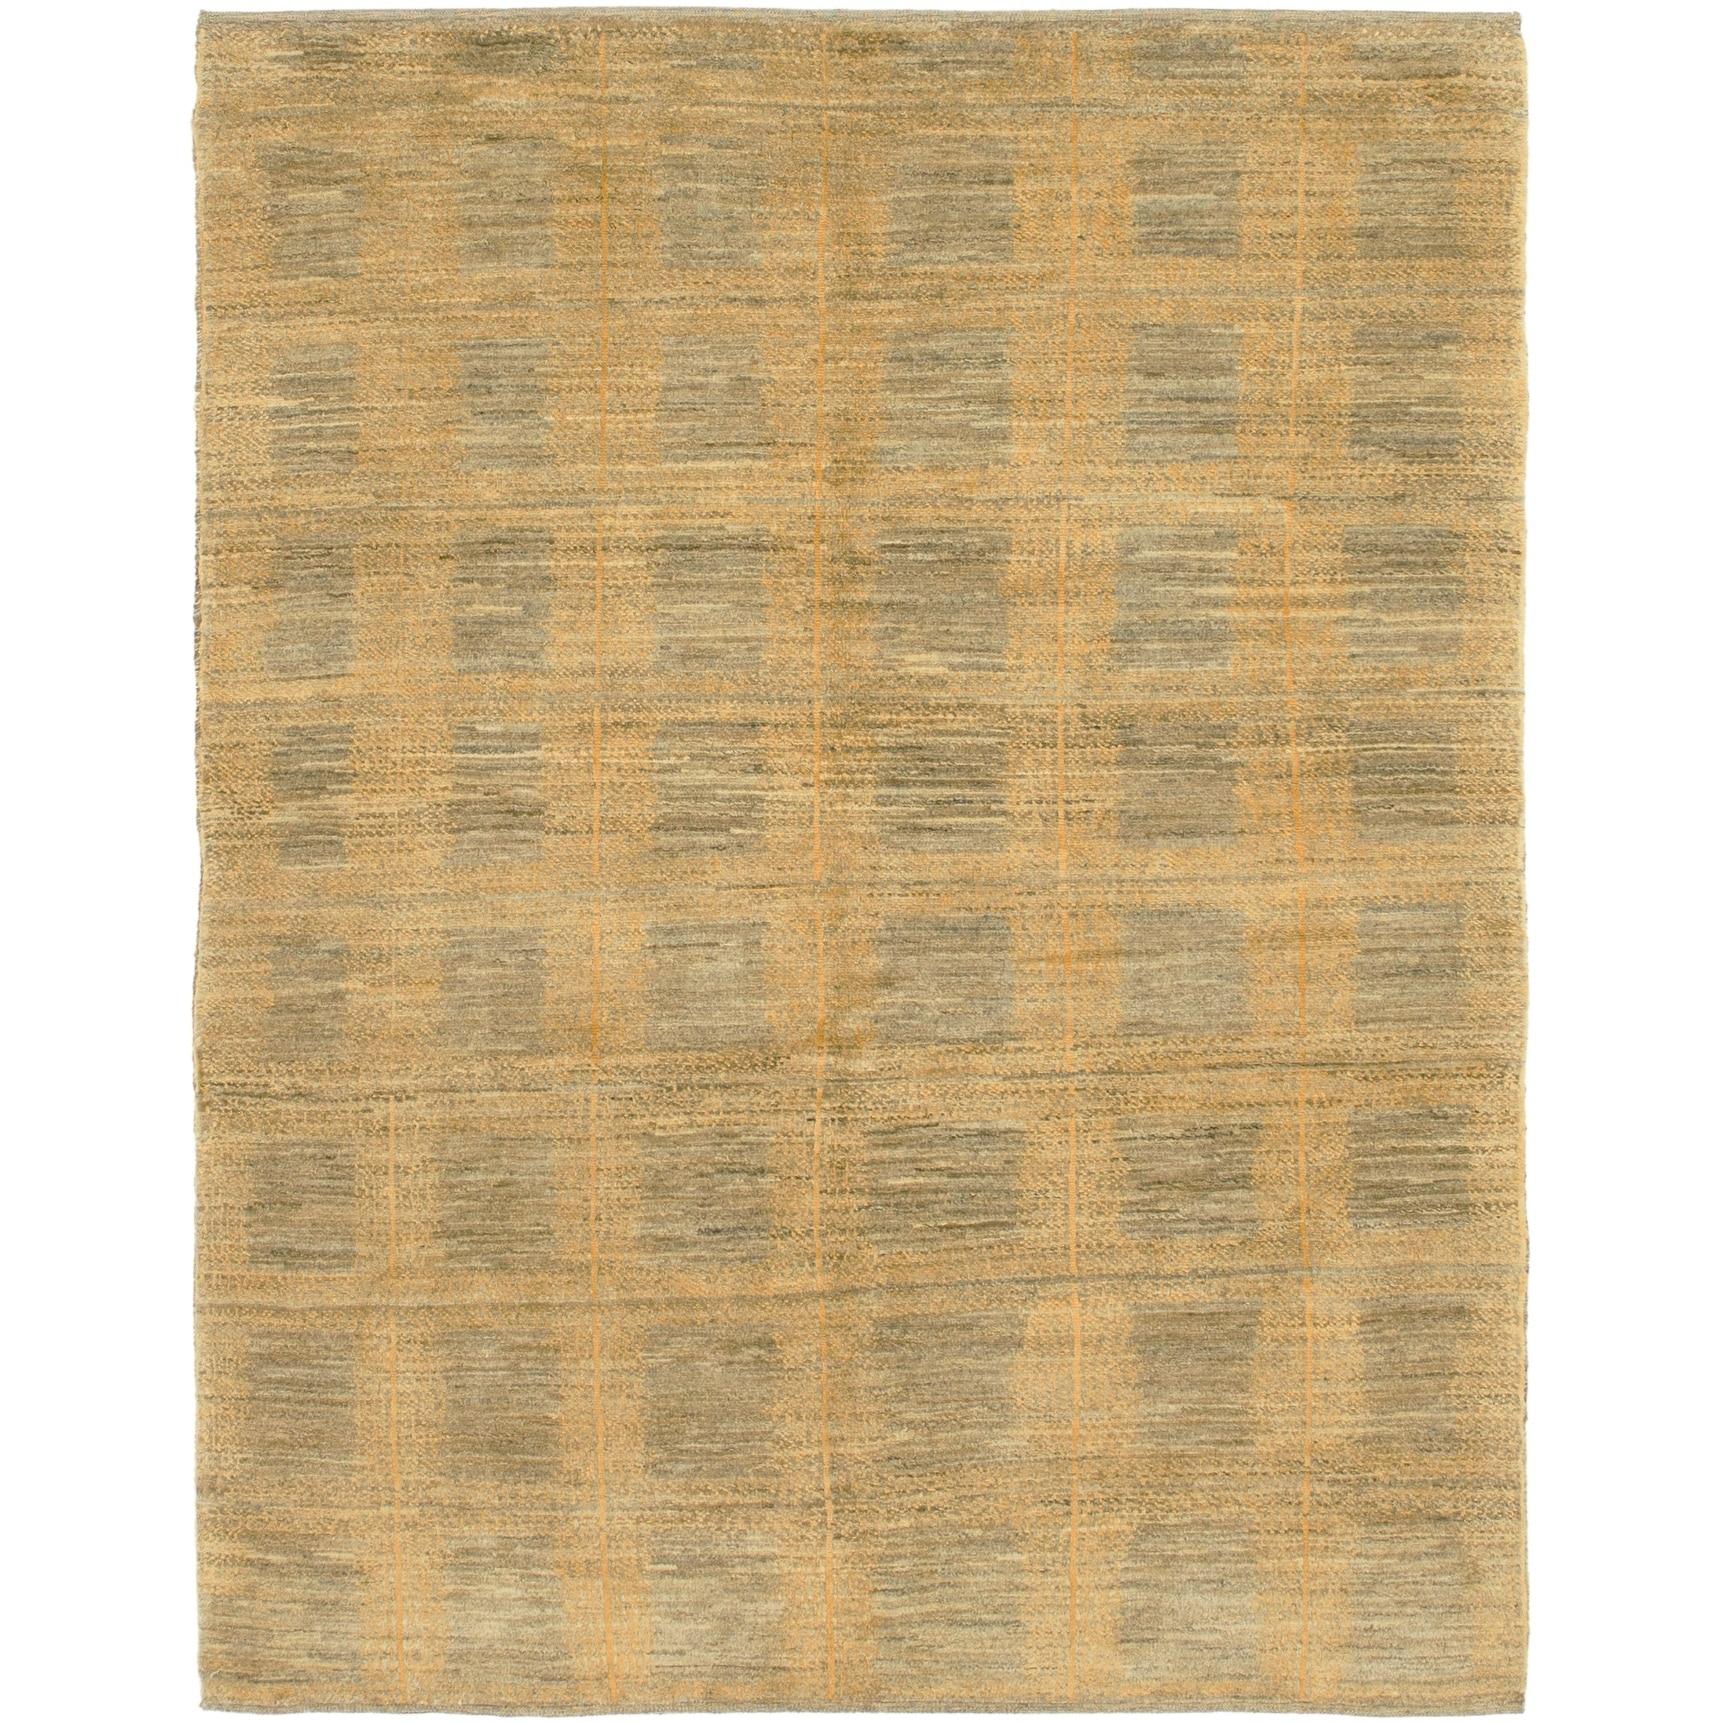 Hand Knotted Kashkuli Gabbeh Wool Area Rug - 4 10 x 6 5 (Brown - 4 10 x 6 5)